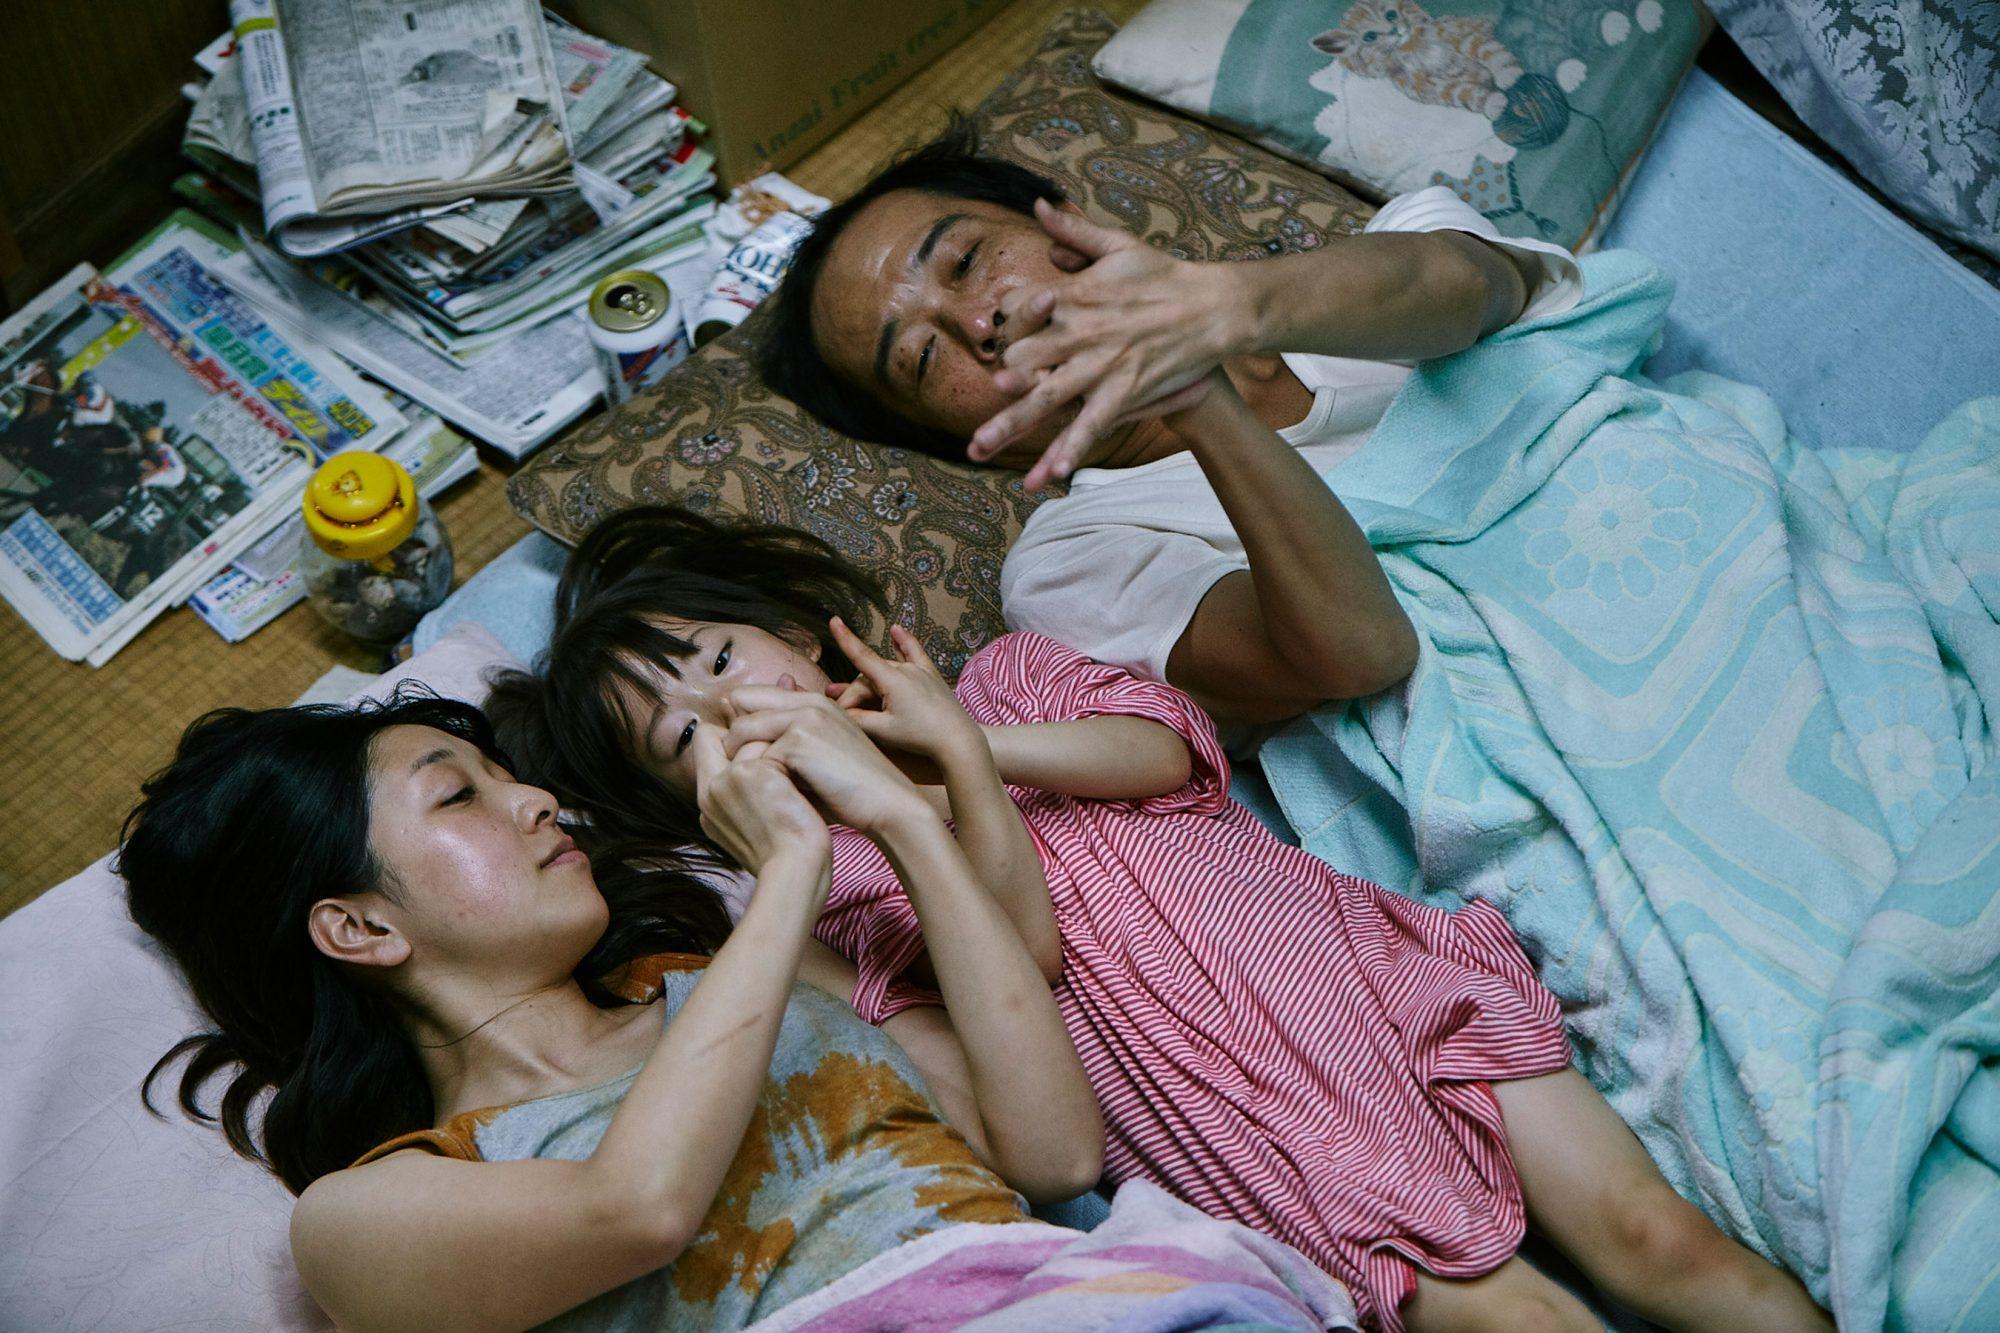 ShopliftersAndo Sakura, Sasaki Miyu and Lily Franky